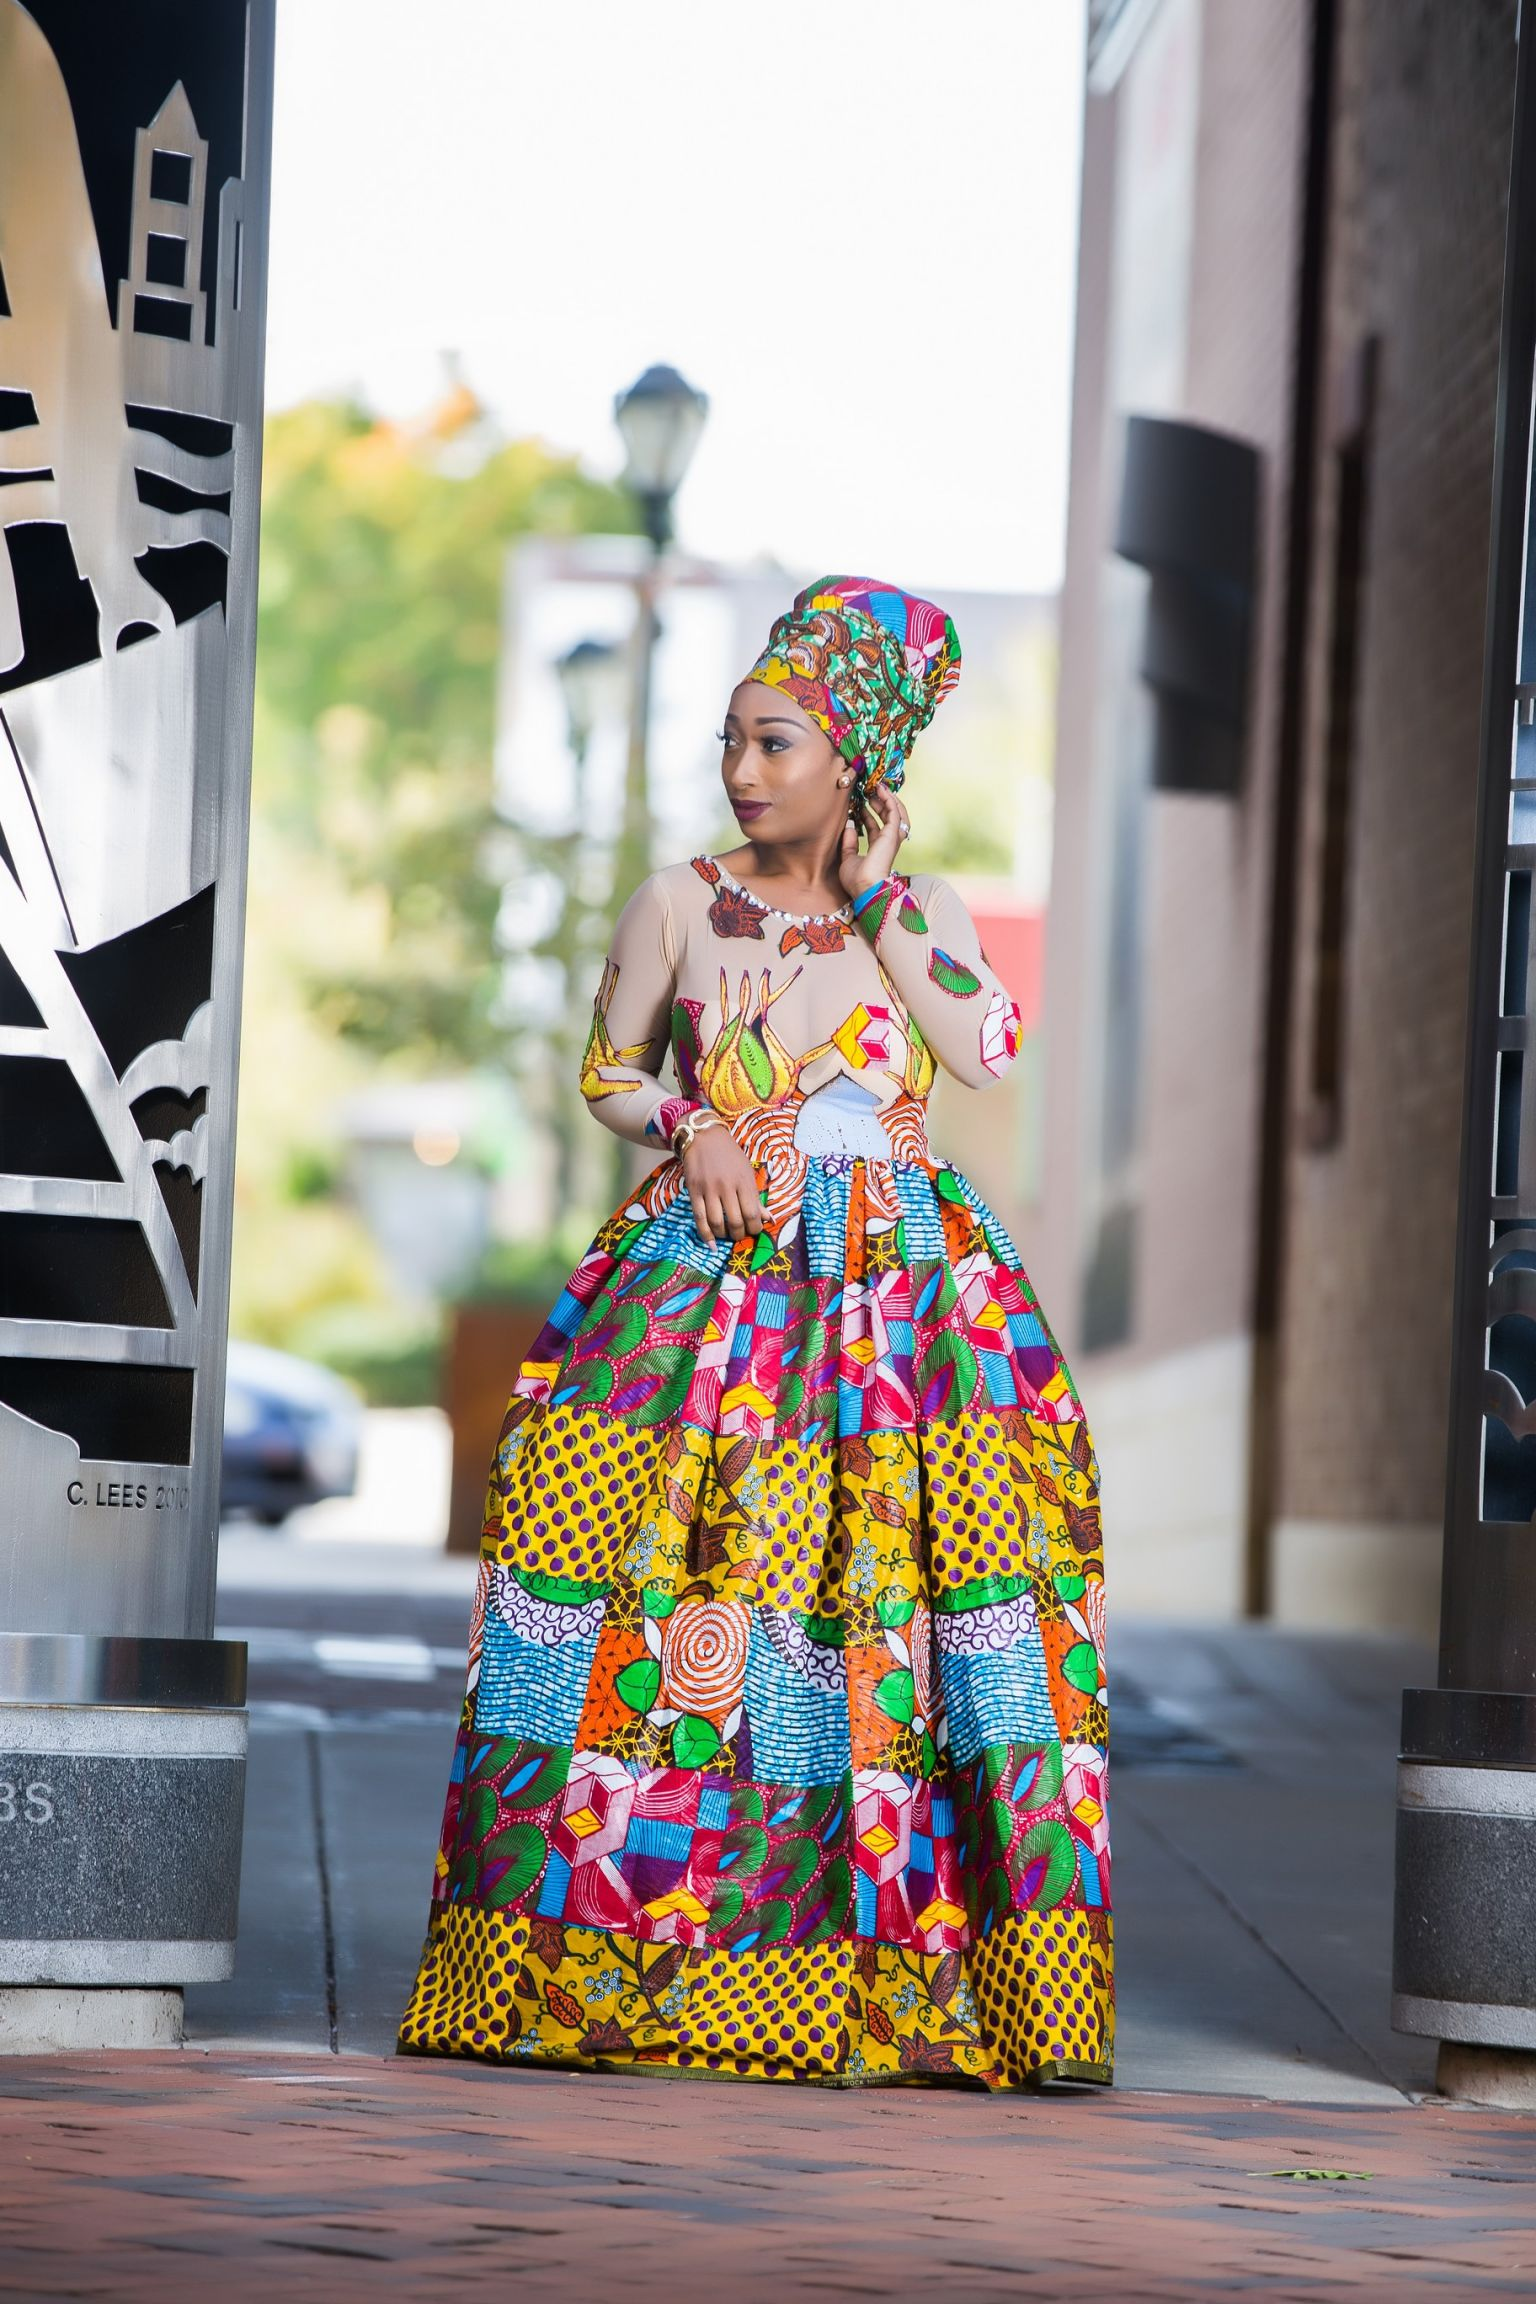 ankara-street-style-of-the-day-chic-ama-1